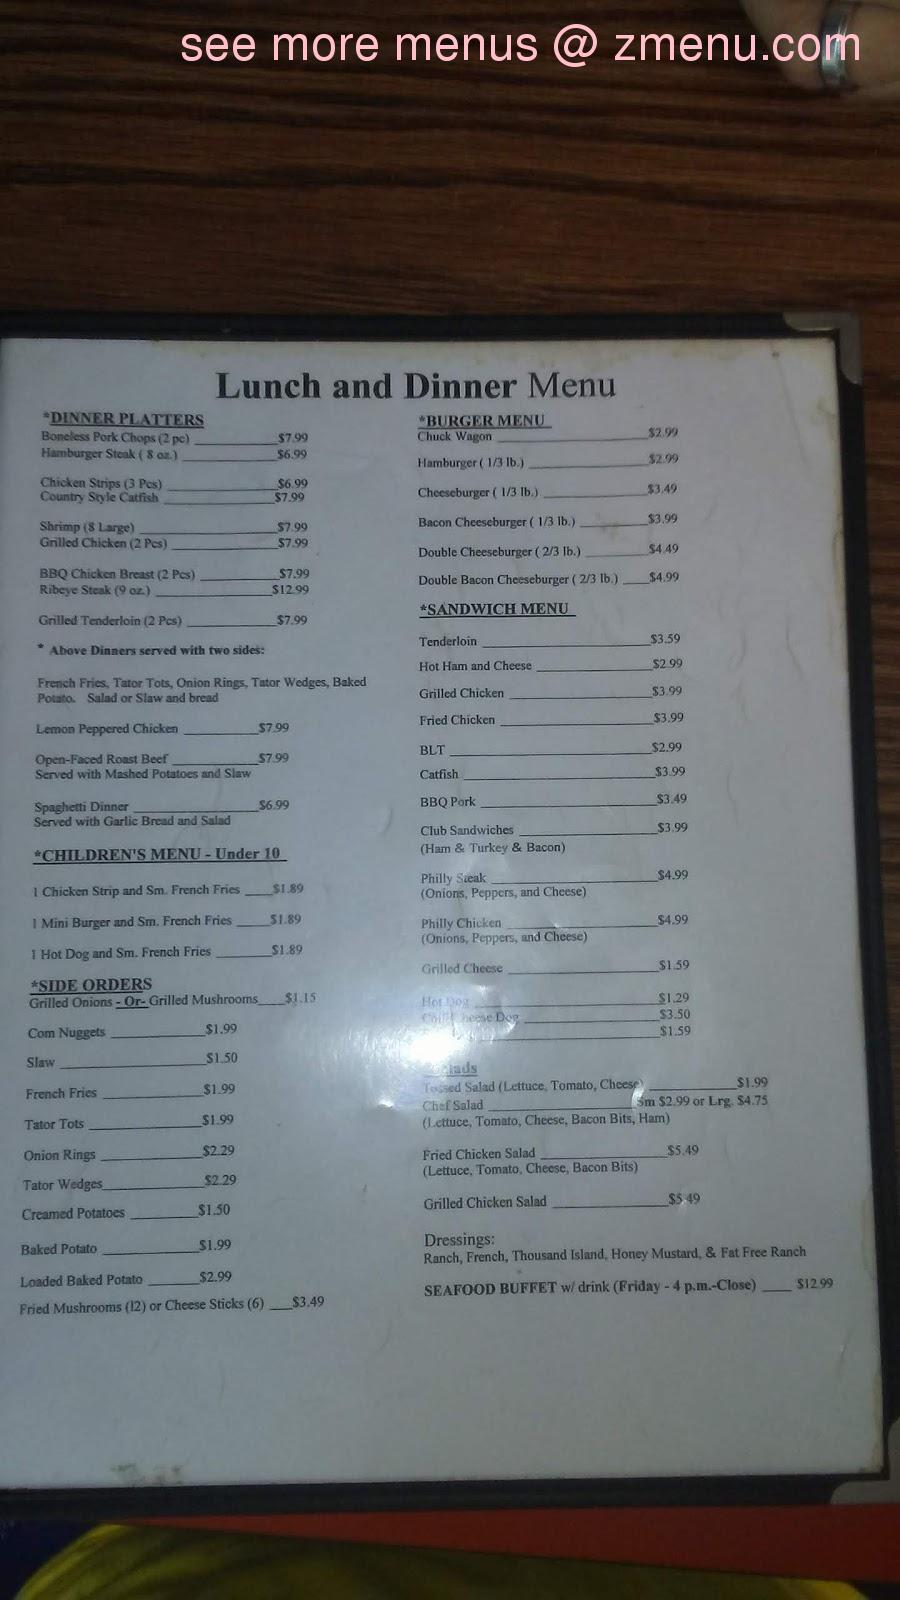 Online Menu of Old Times Cafe Restaurant, Spencer, Tennessee